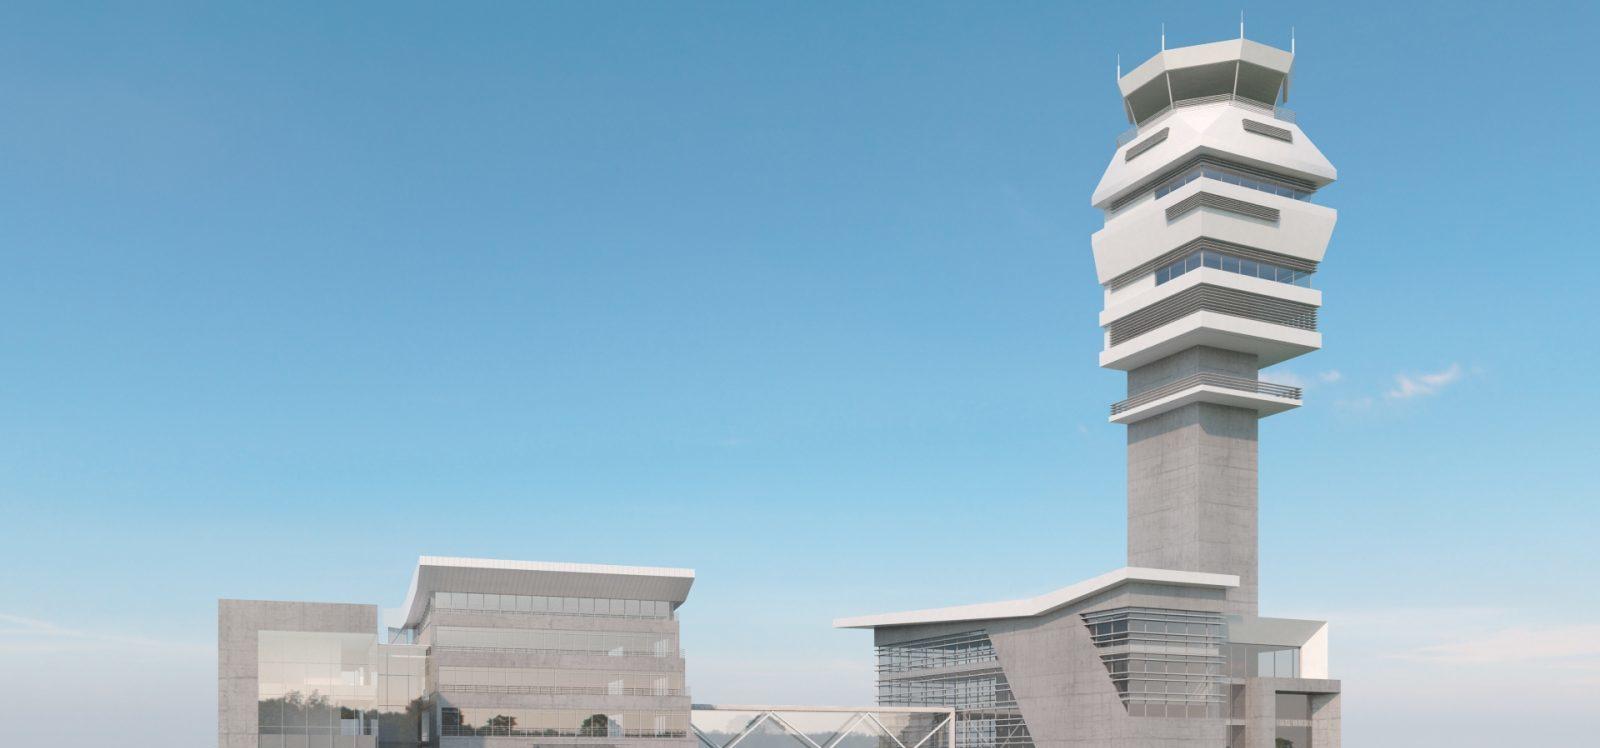 "Potpisan ugovor za izgradnju novog tornja na aerodromu ""Nikola Tesla"""